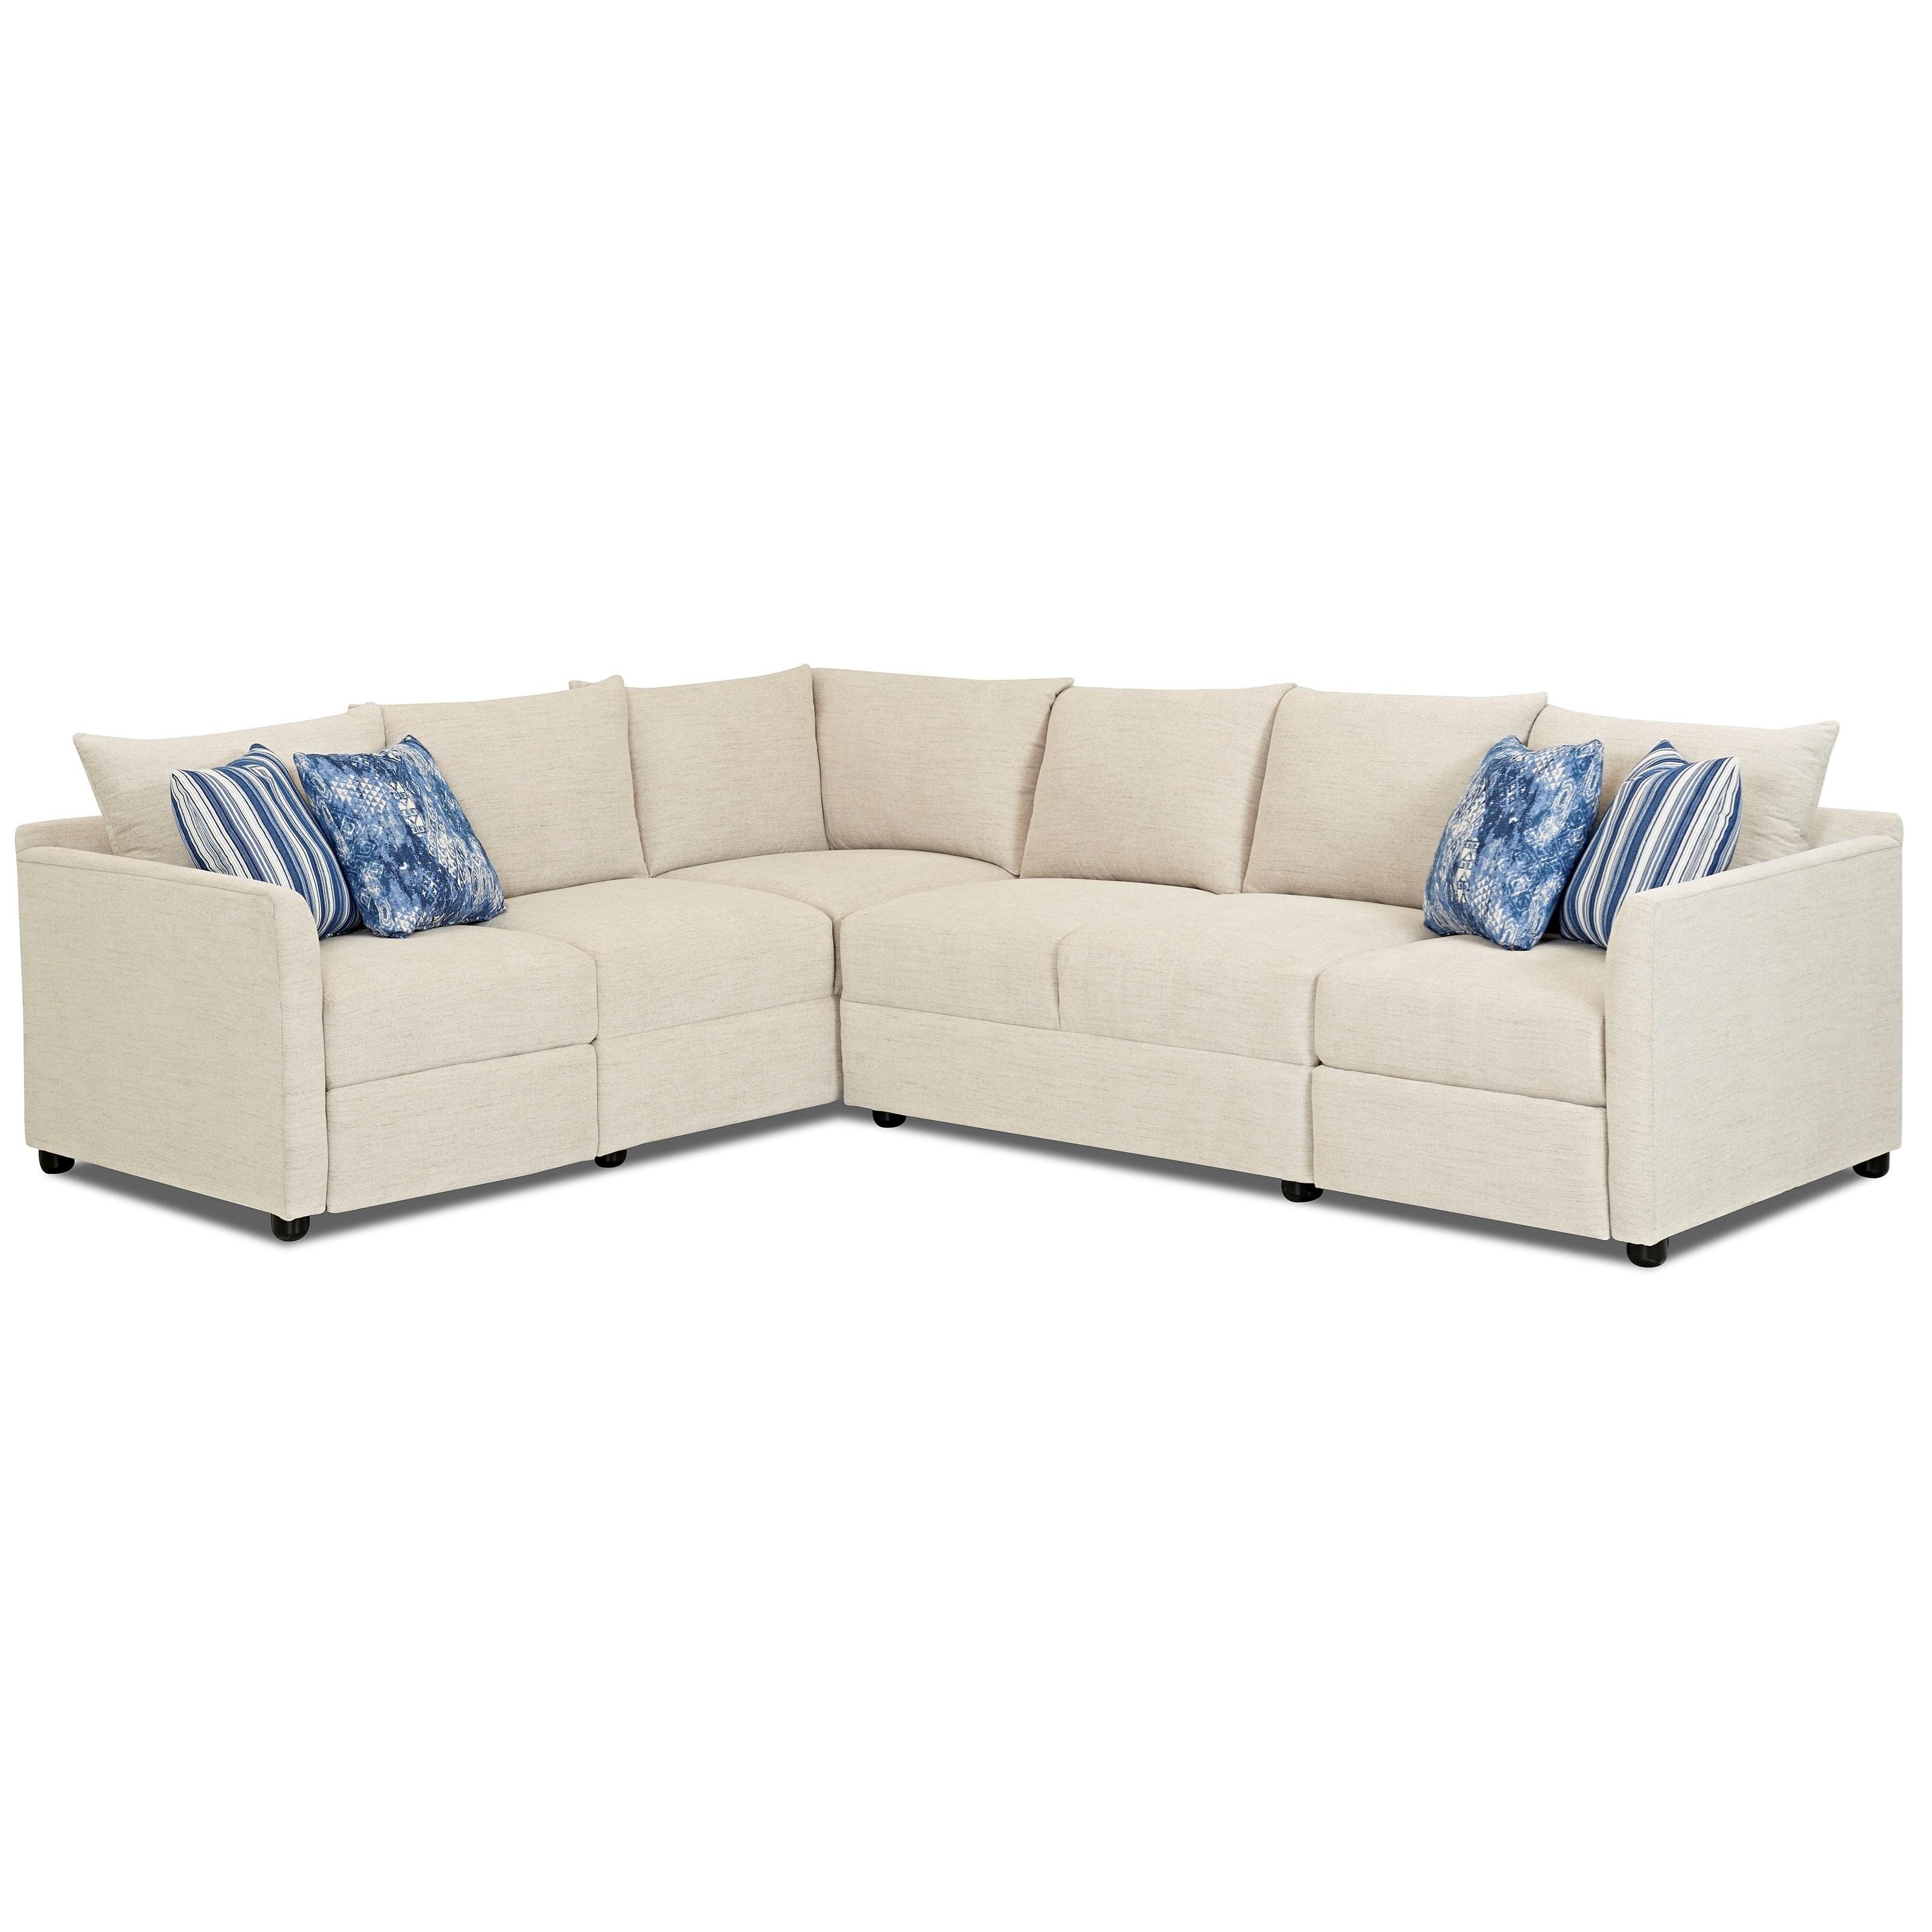 Atlanta 2 Pc Power Hybrid Reclining Sectional Sofa by Klaussner at Lapeer Furniture & Mattress Center